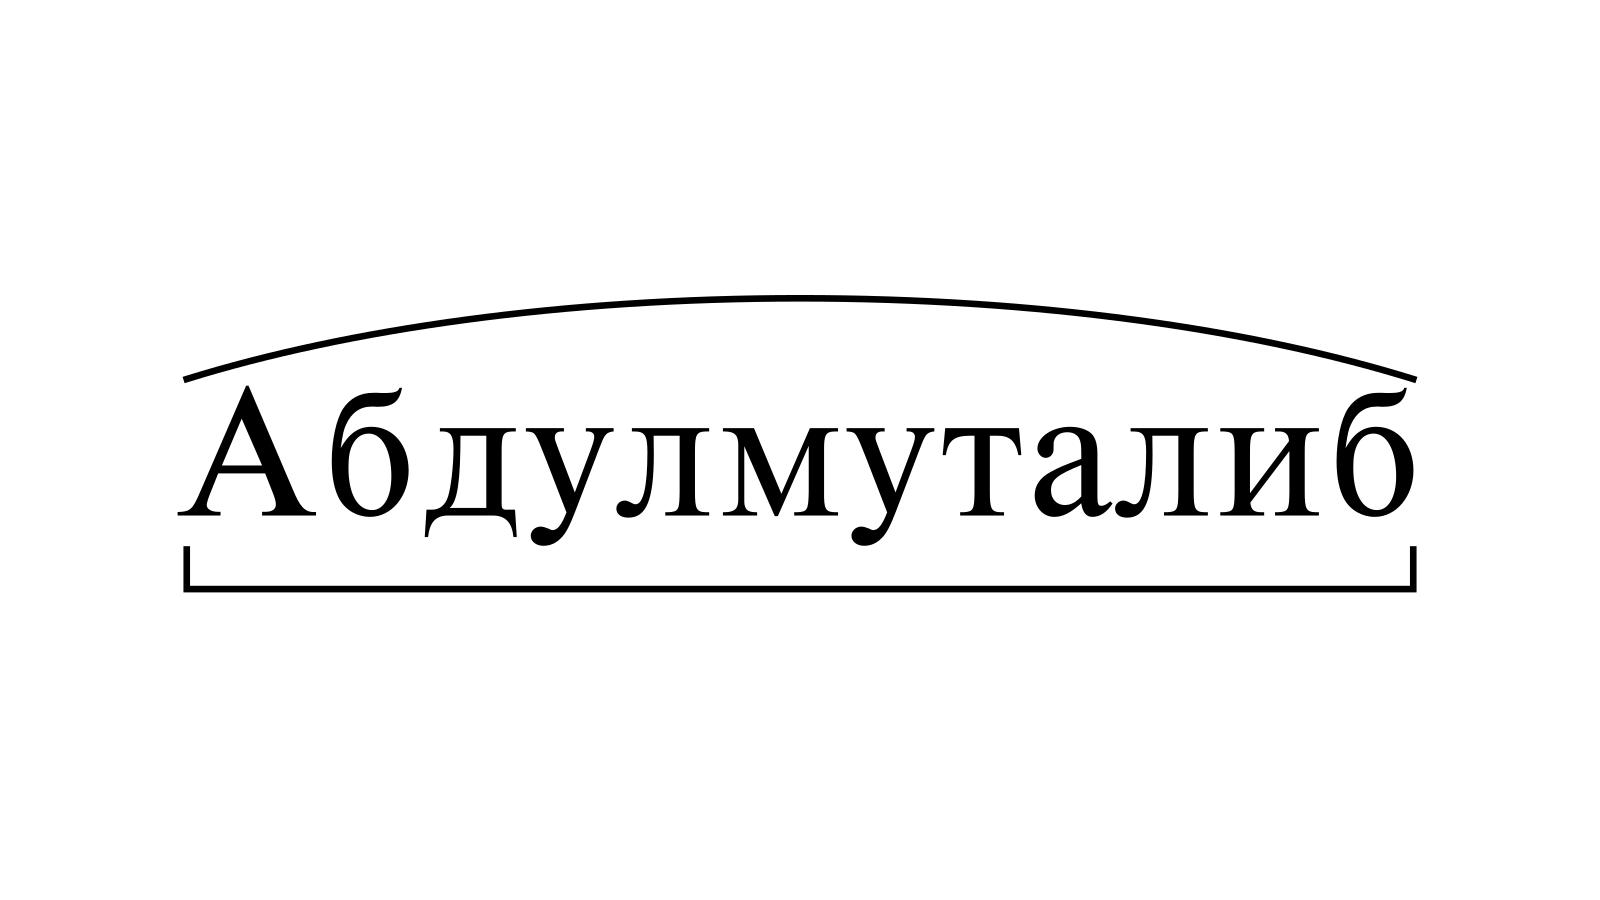 Разбор слова «Абдулмуталиб» по составу